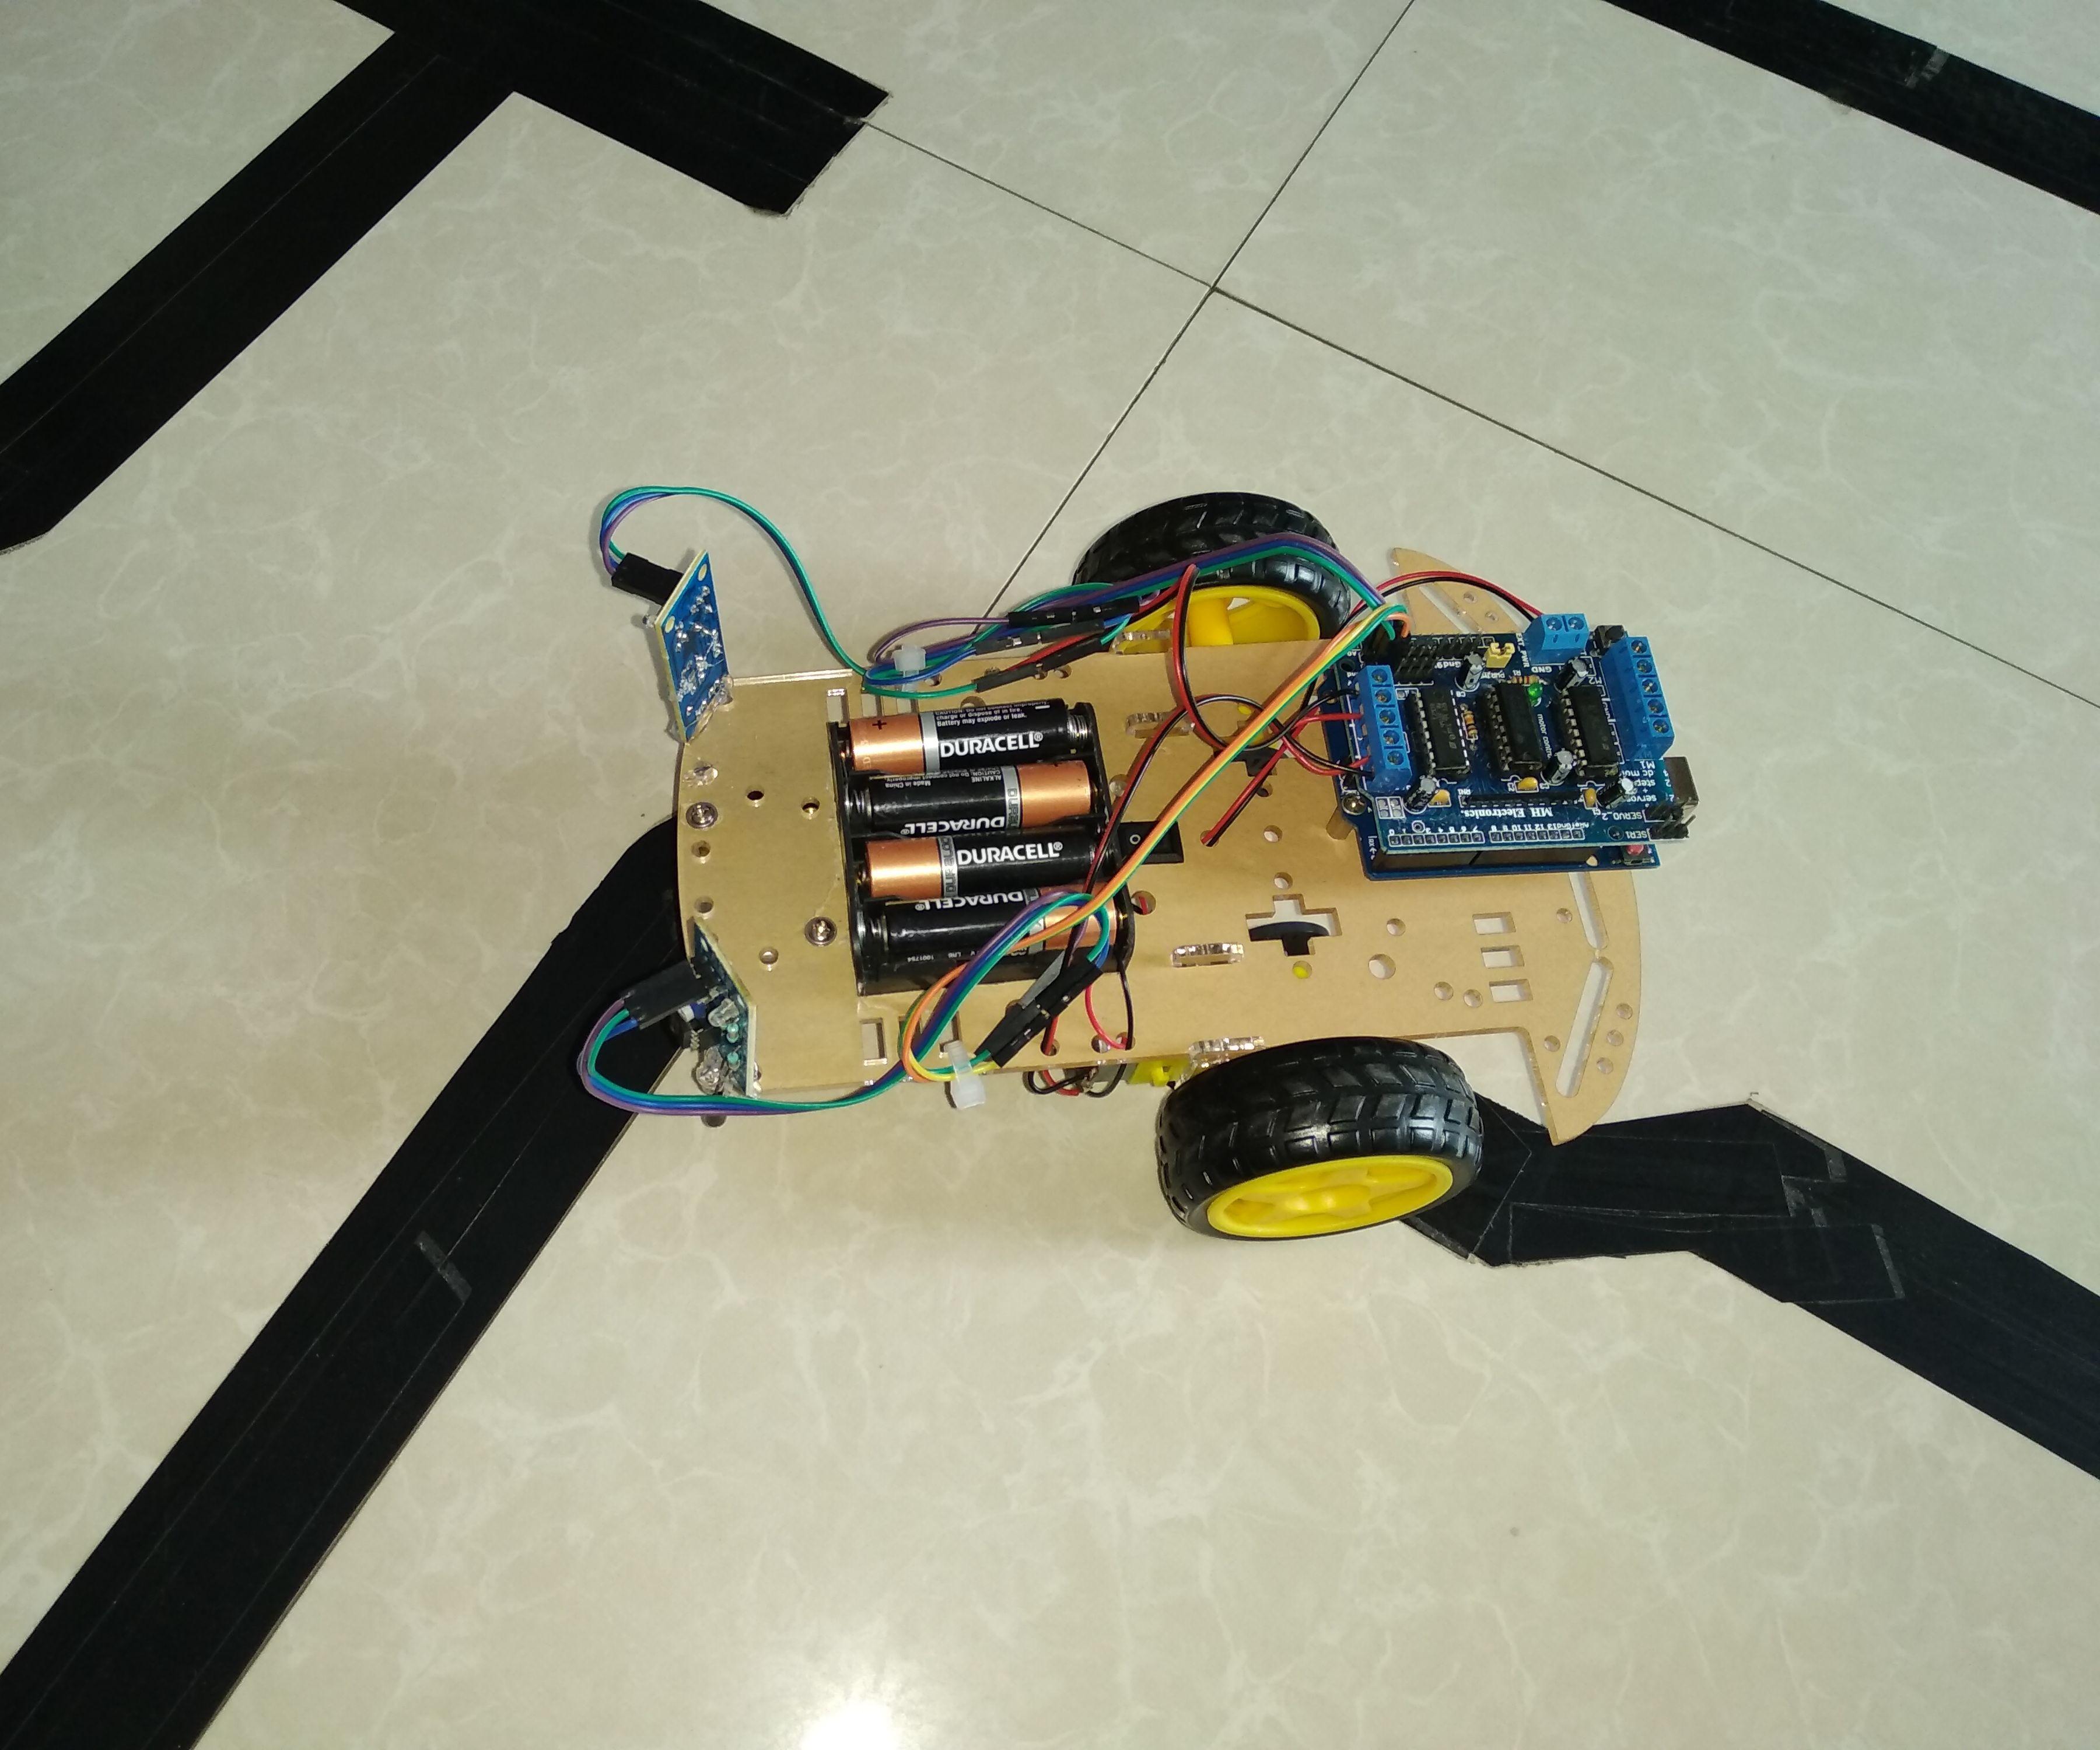 How to Make Line Follower Robot Using Arduino: 5 Steps